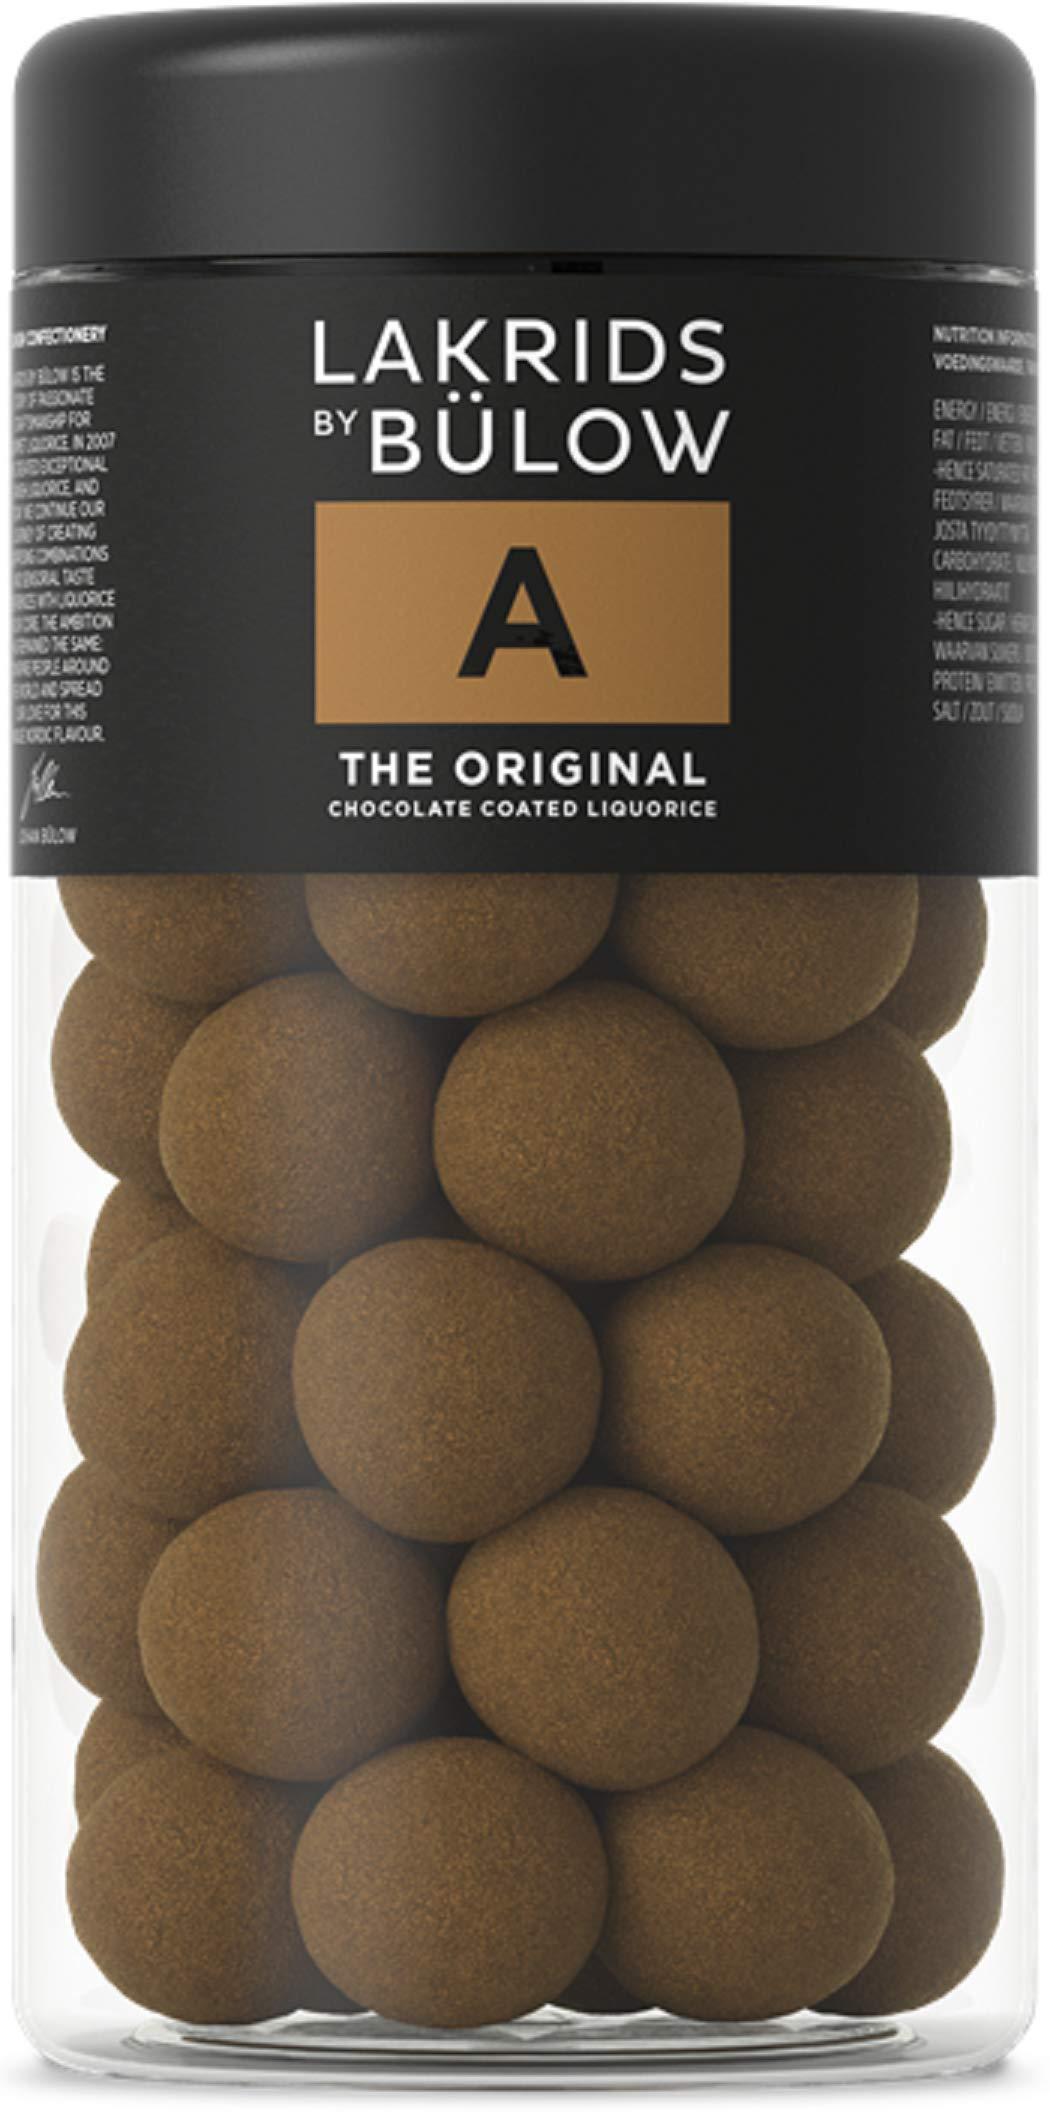 Lakrids by Johan Bülow A - The Original Chocolate Coated Liquorice (265g) by Lakrids